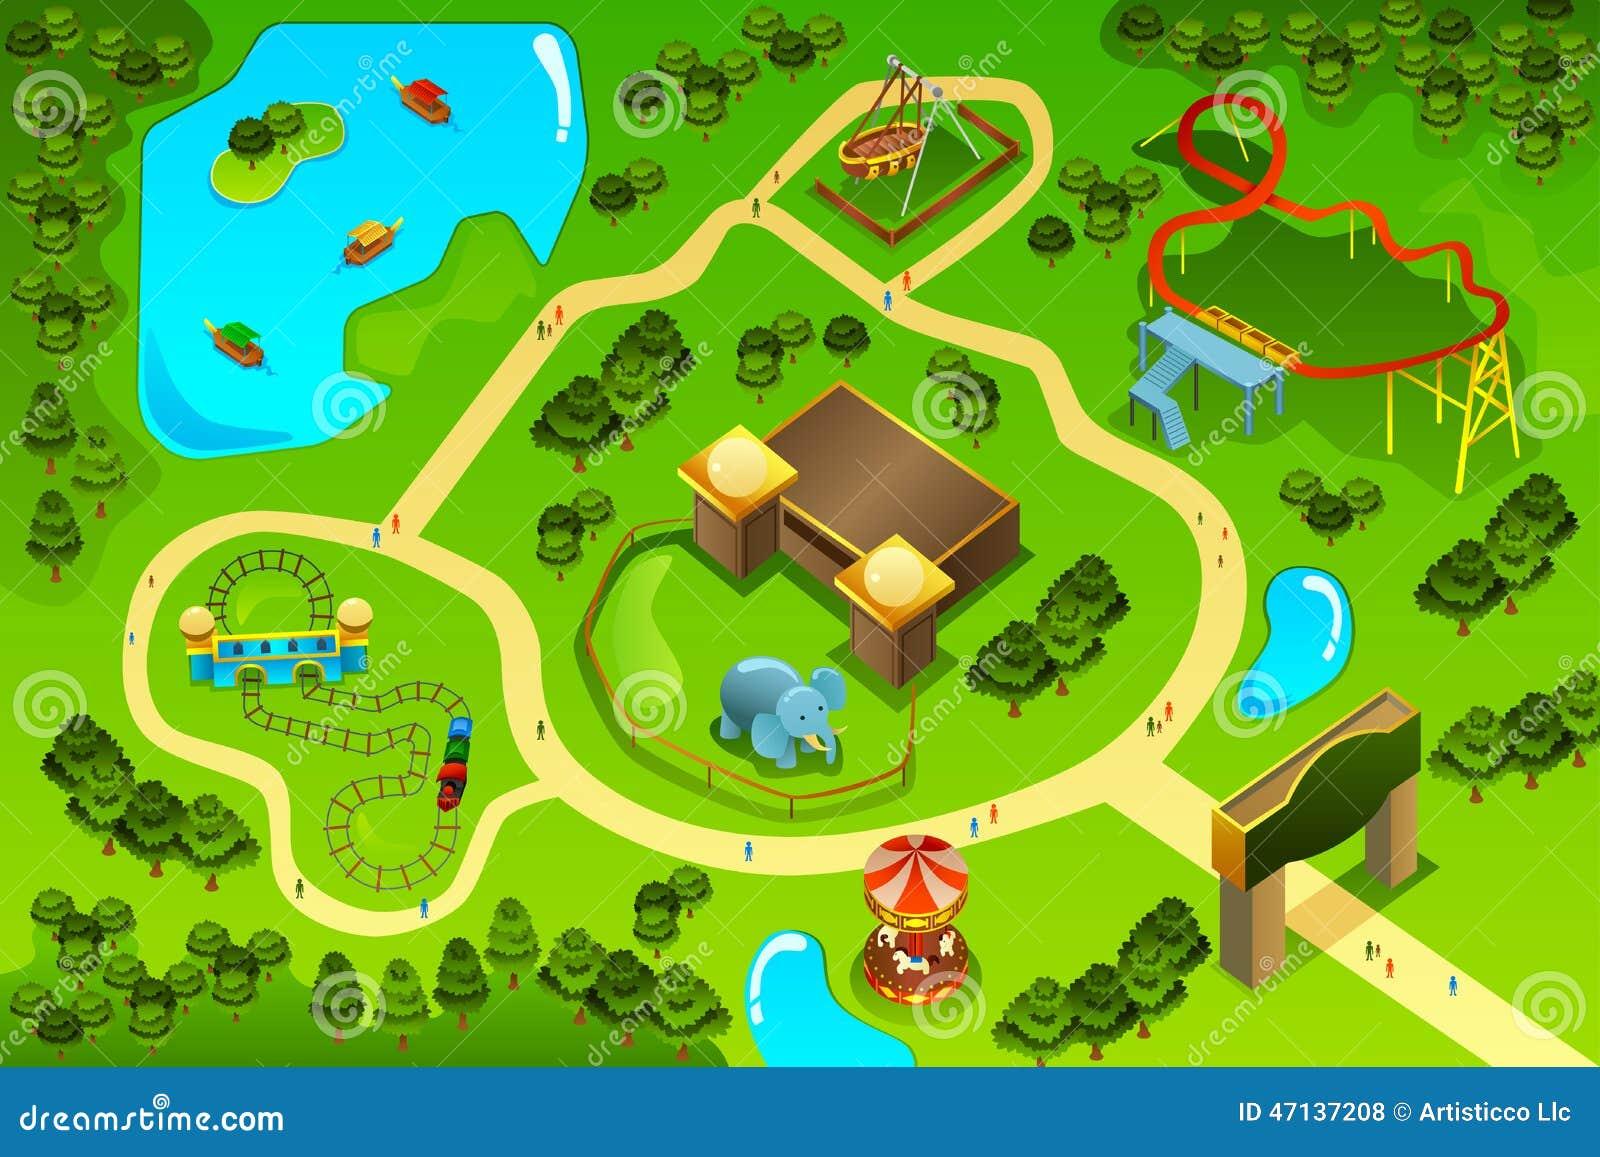 Map Of An Amusement Theme Park Stock Vector Illustration